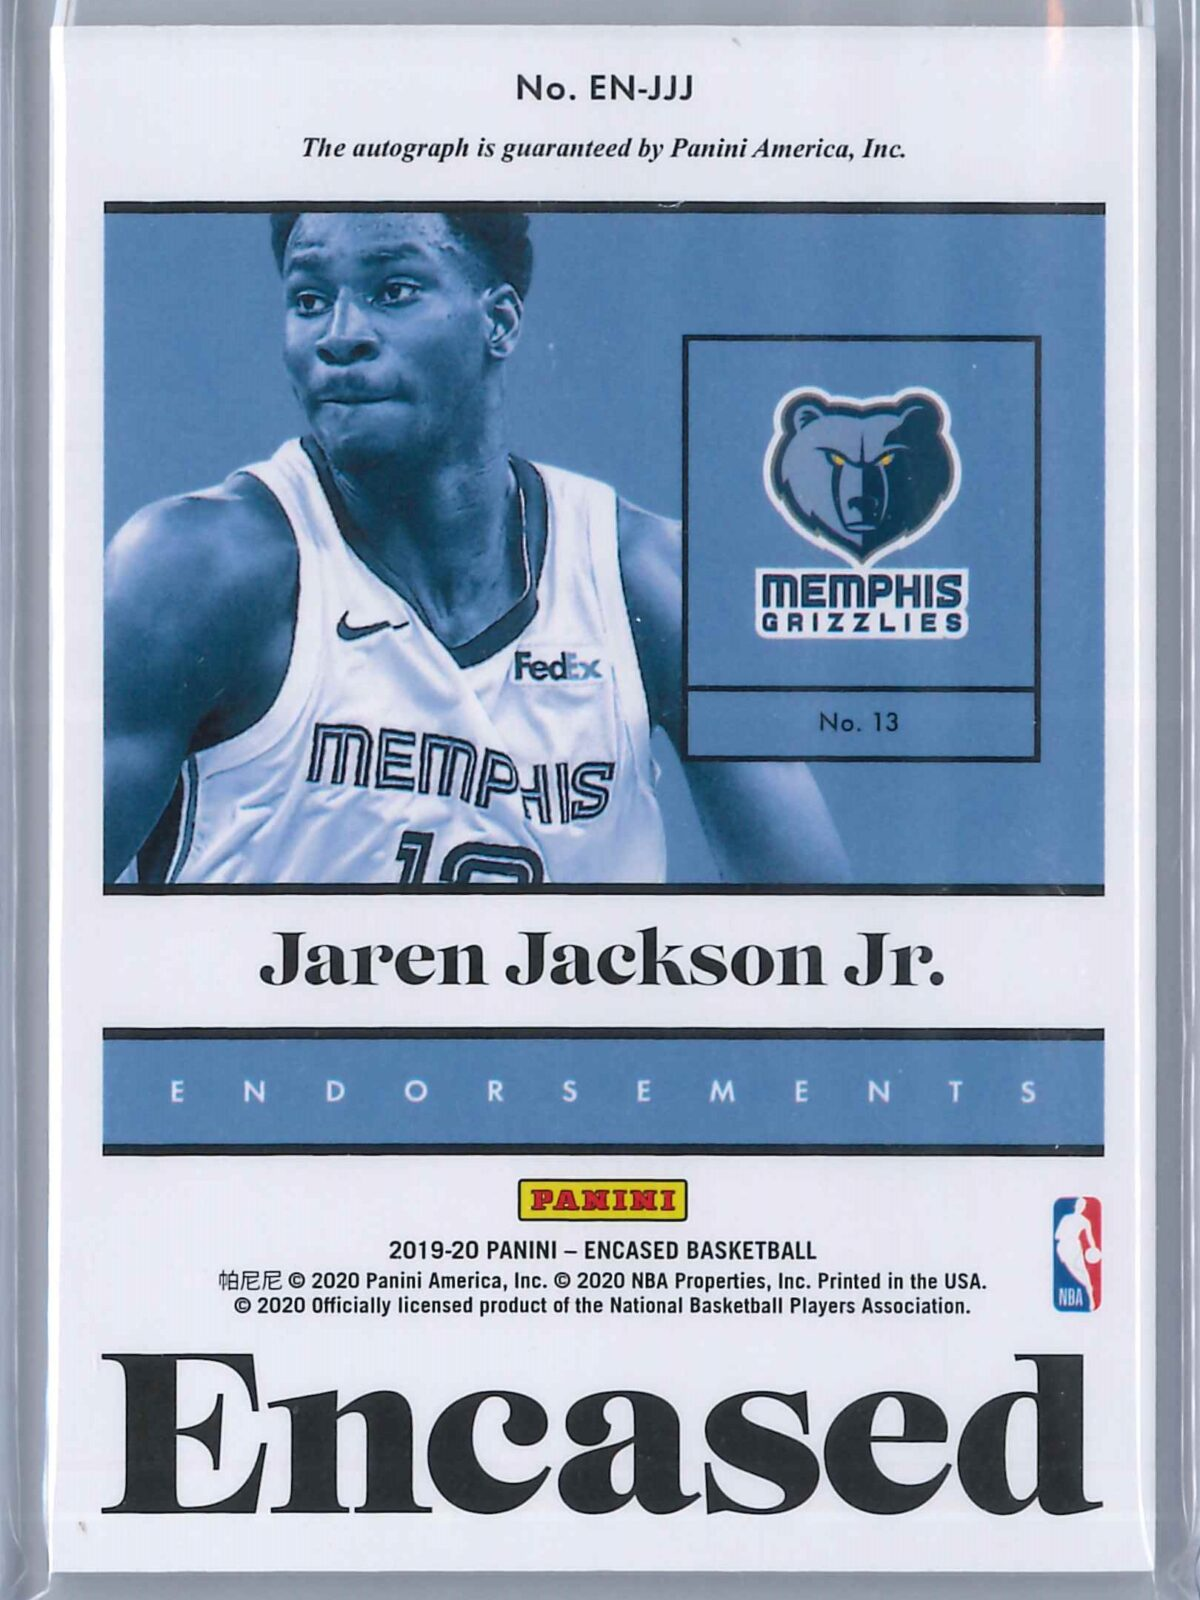 Jaren Jackson Jr. Panini Encased 2019-20 Auto Endorsements 16/49